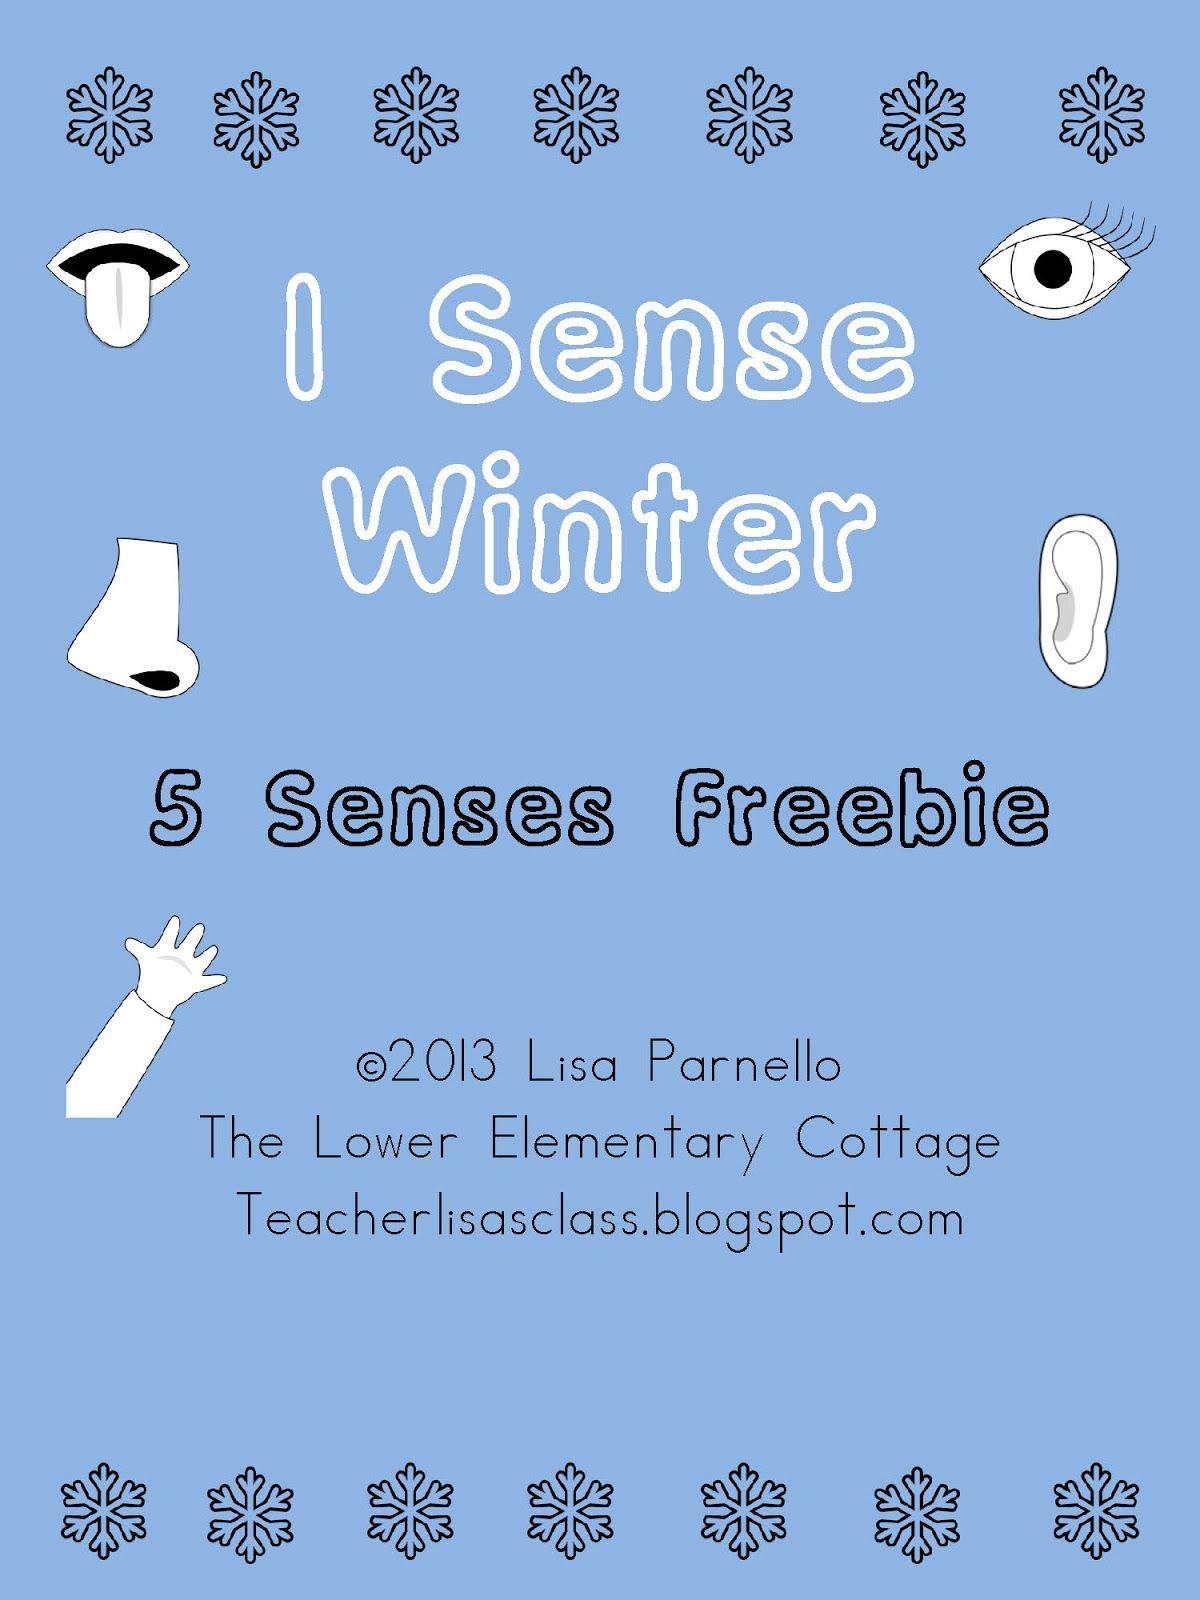 Winter 5 Senses Freebie